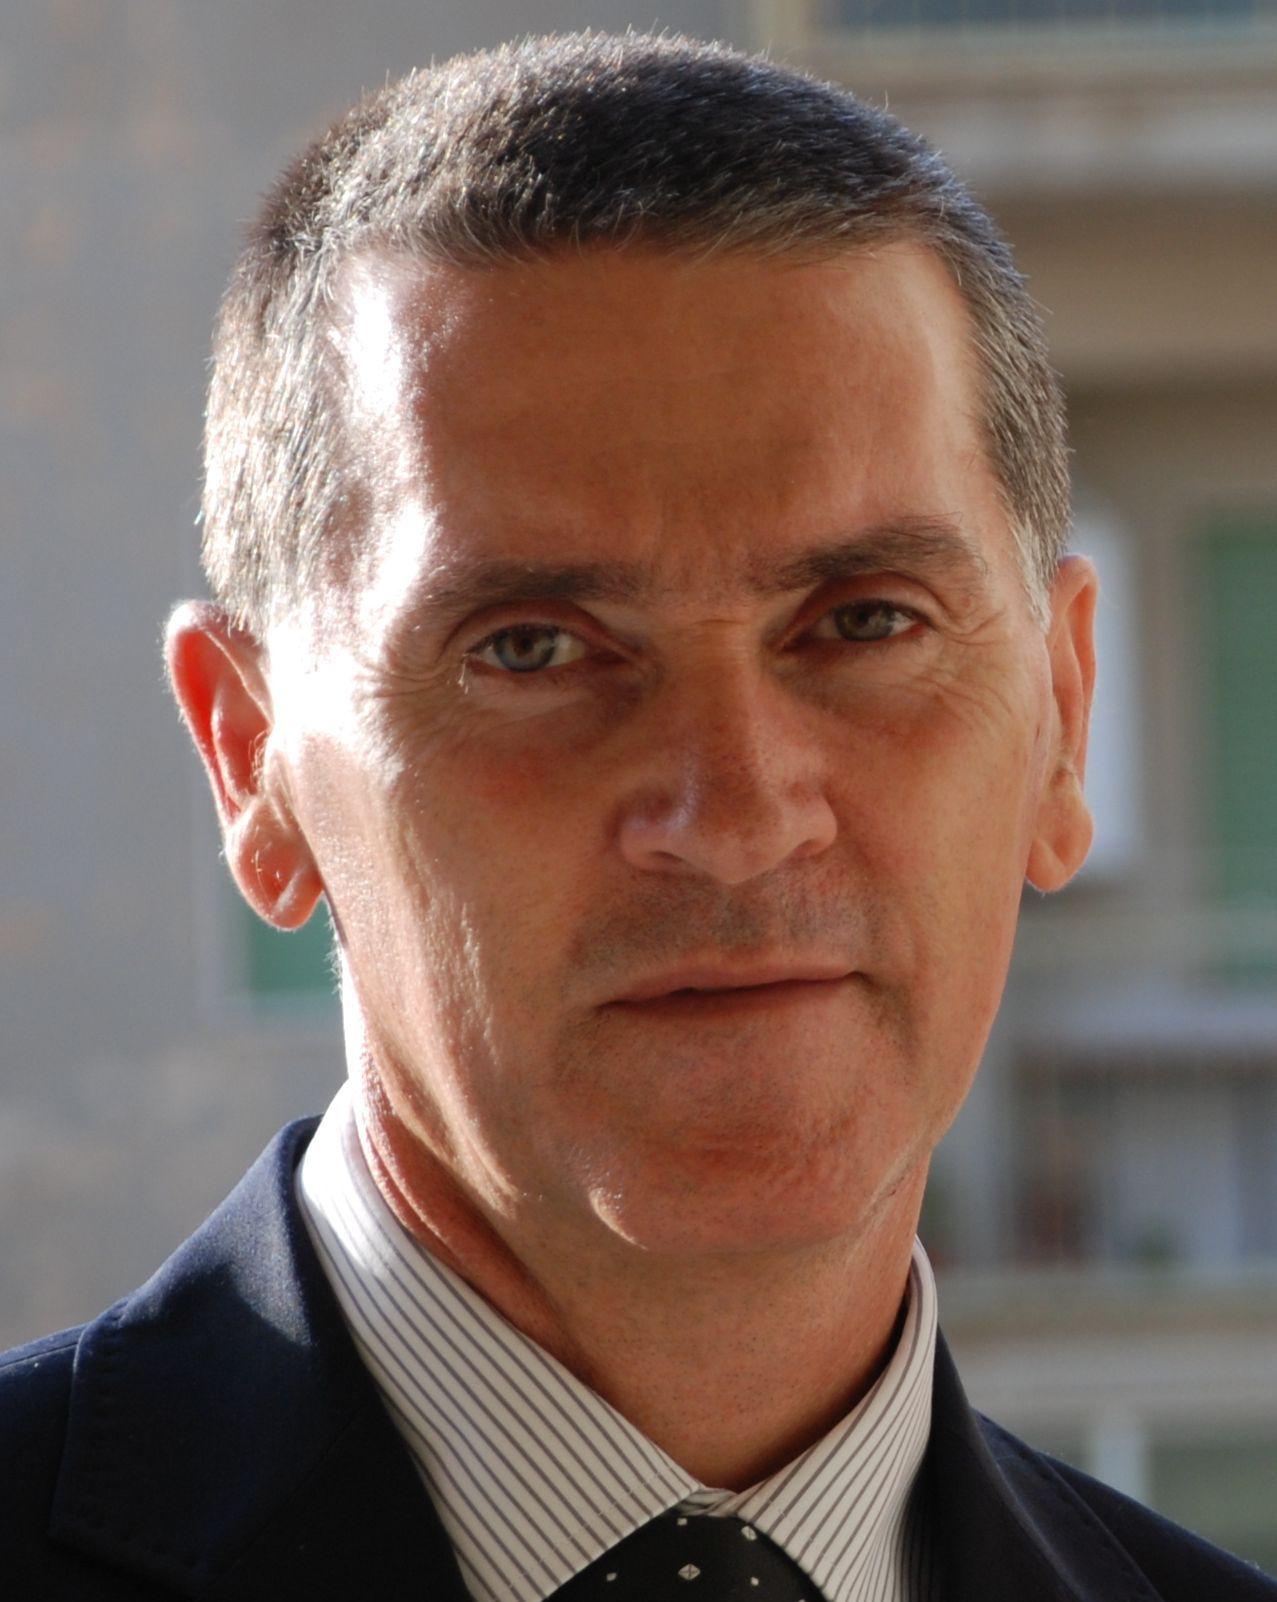 Enzo Coppola